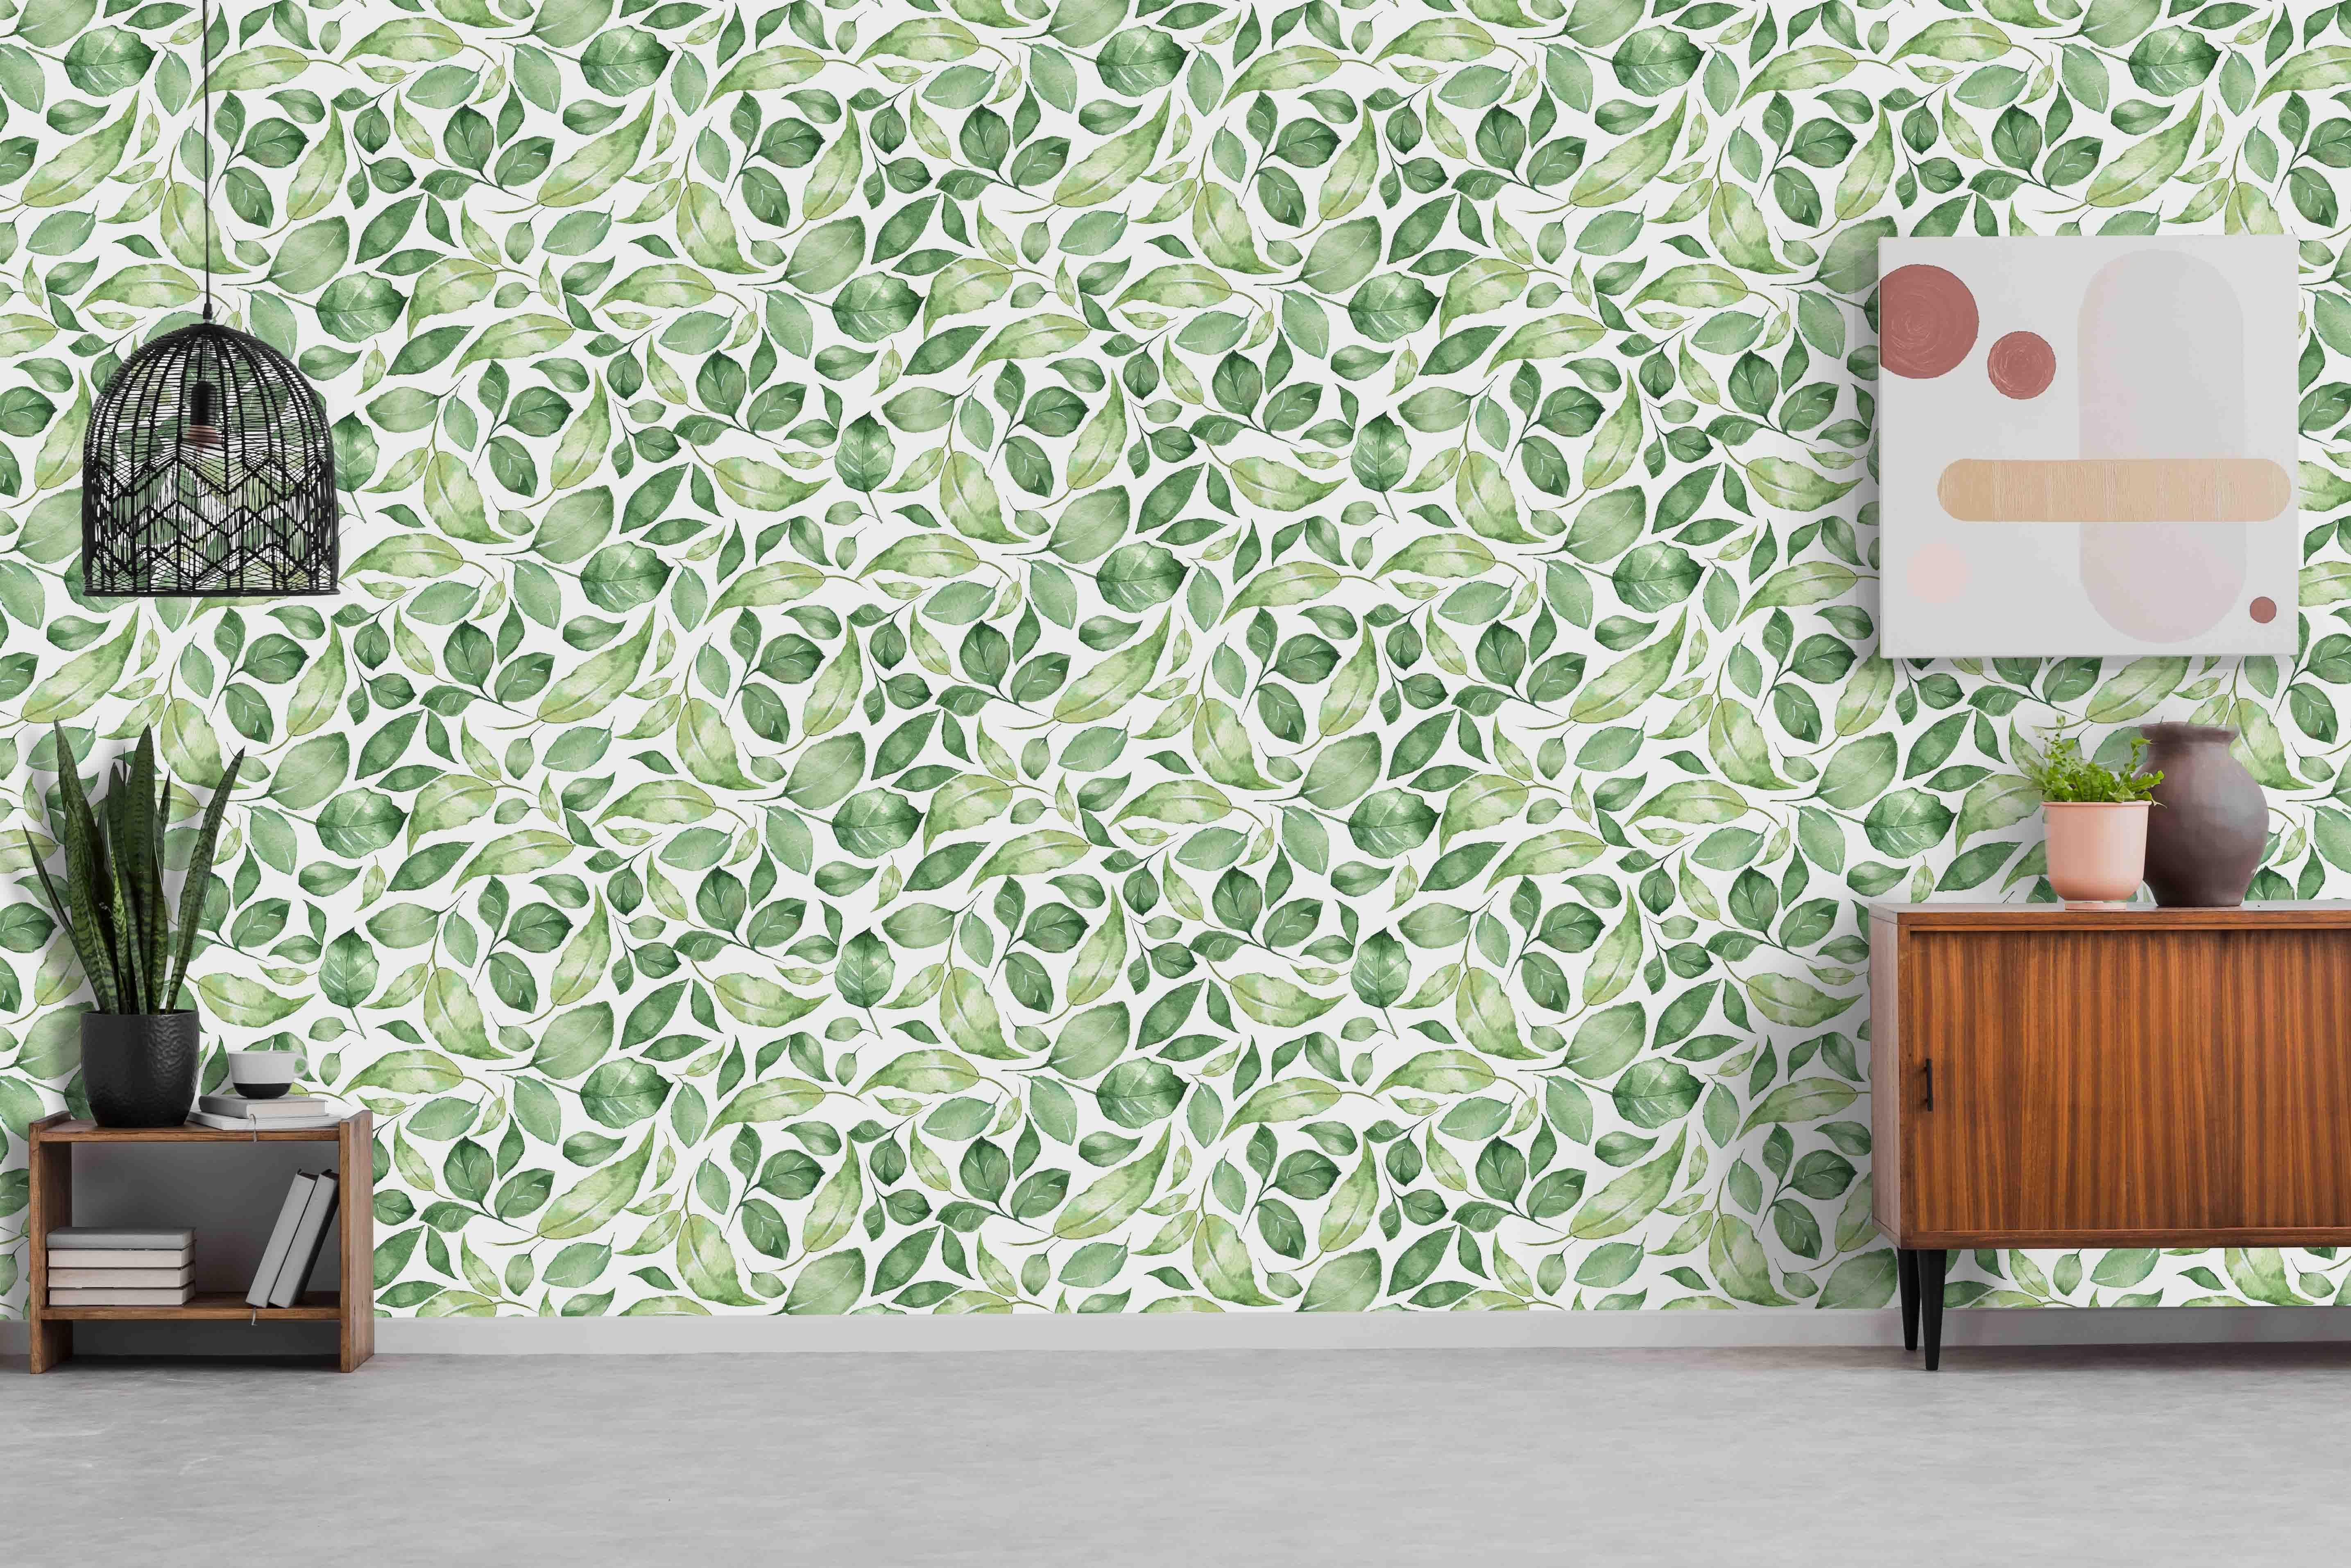 Watercolor Greenery Pattern Wallpaper Removable Vinyl Peel Etsy Pattern Wallpaper Paper Wallpaper Wallpaper